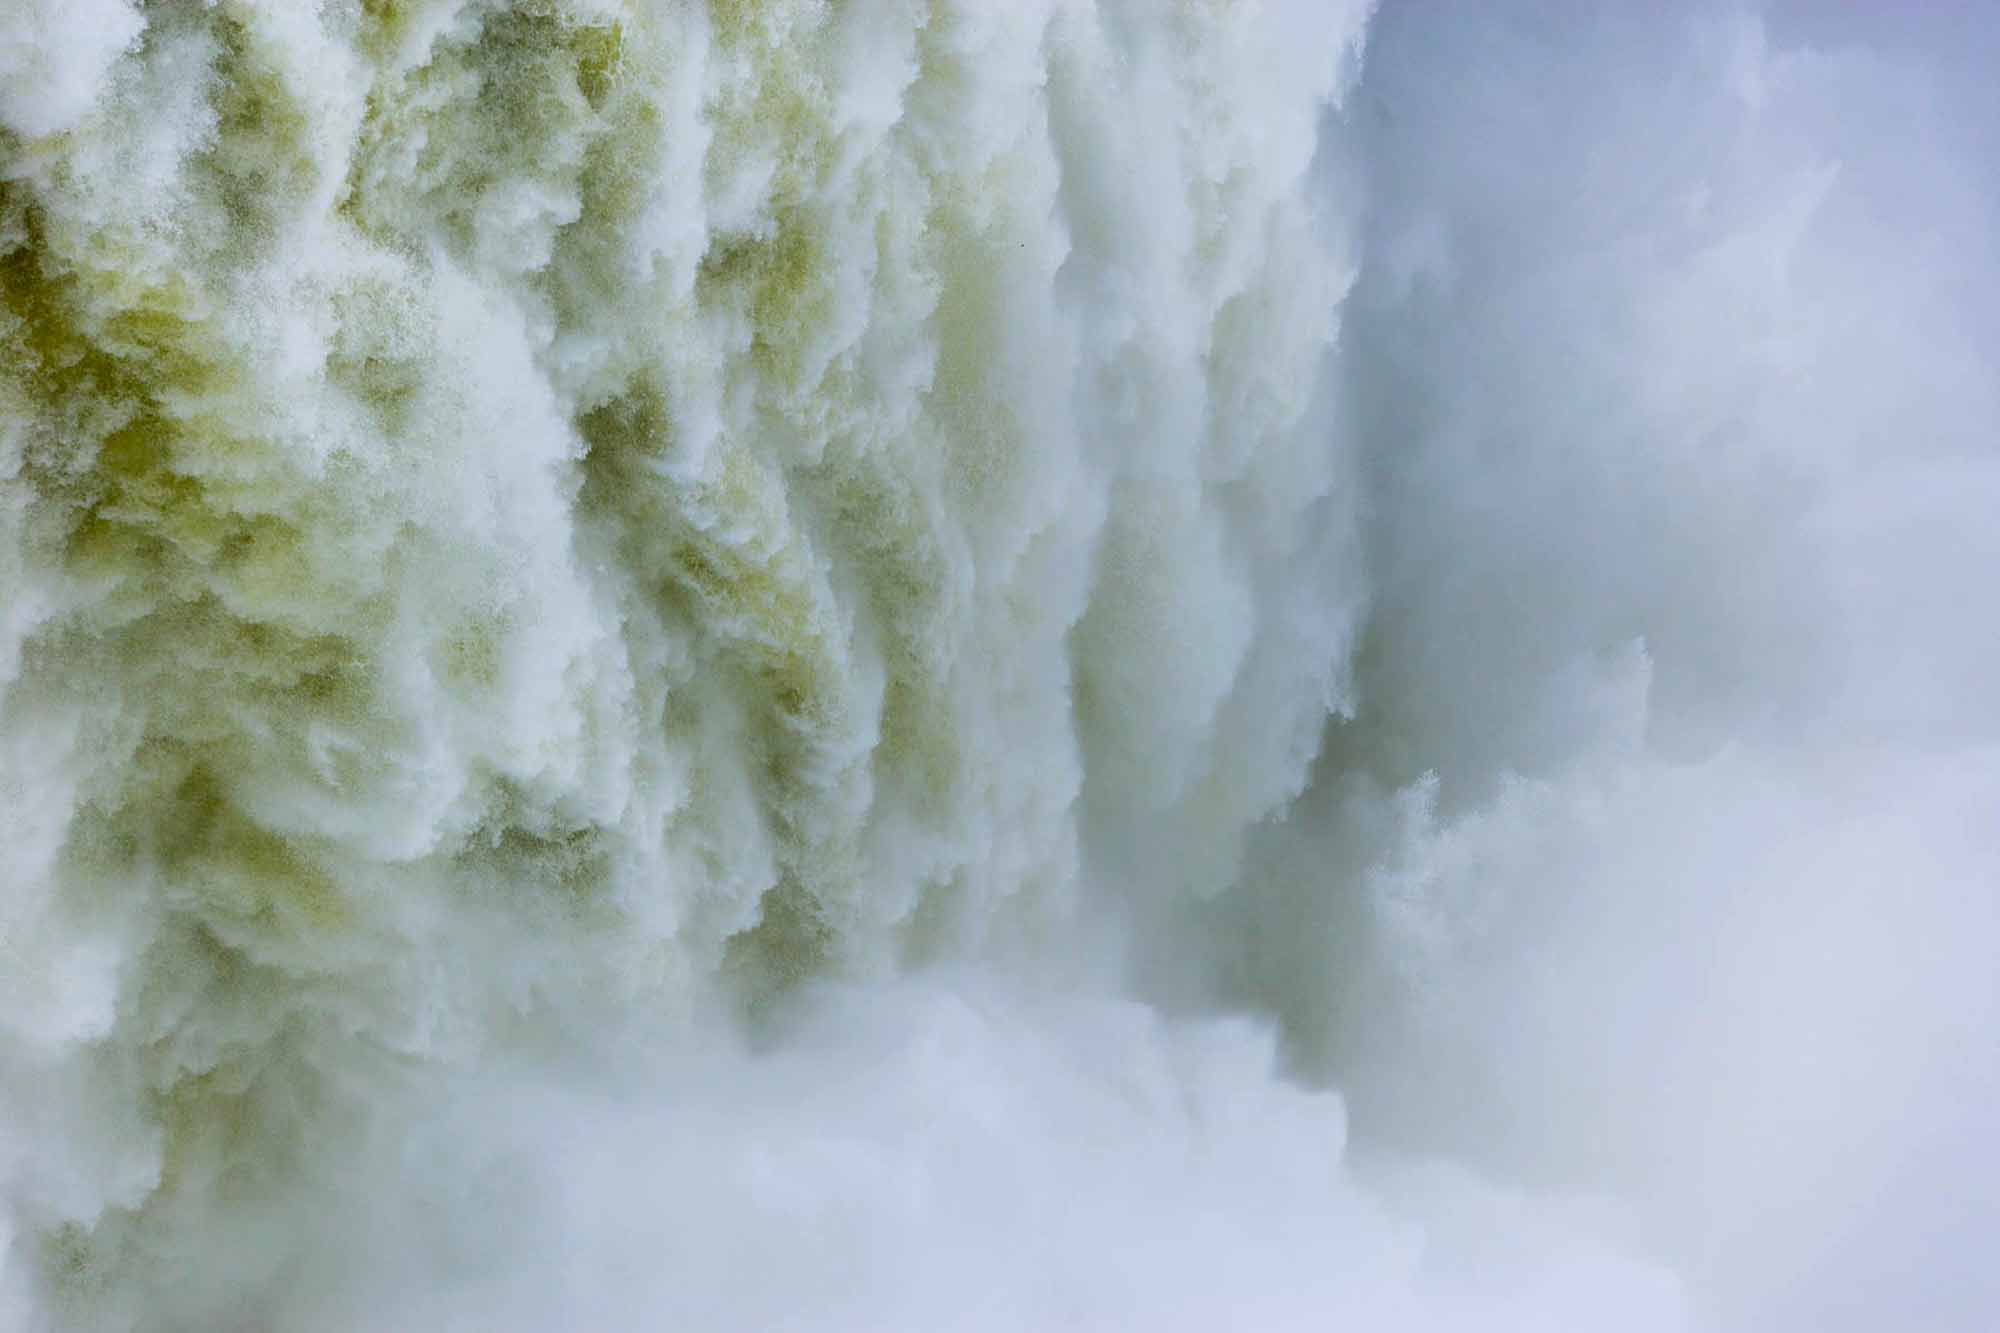 Waterfalls - Yann Arthus-Bertrand